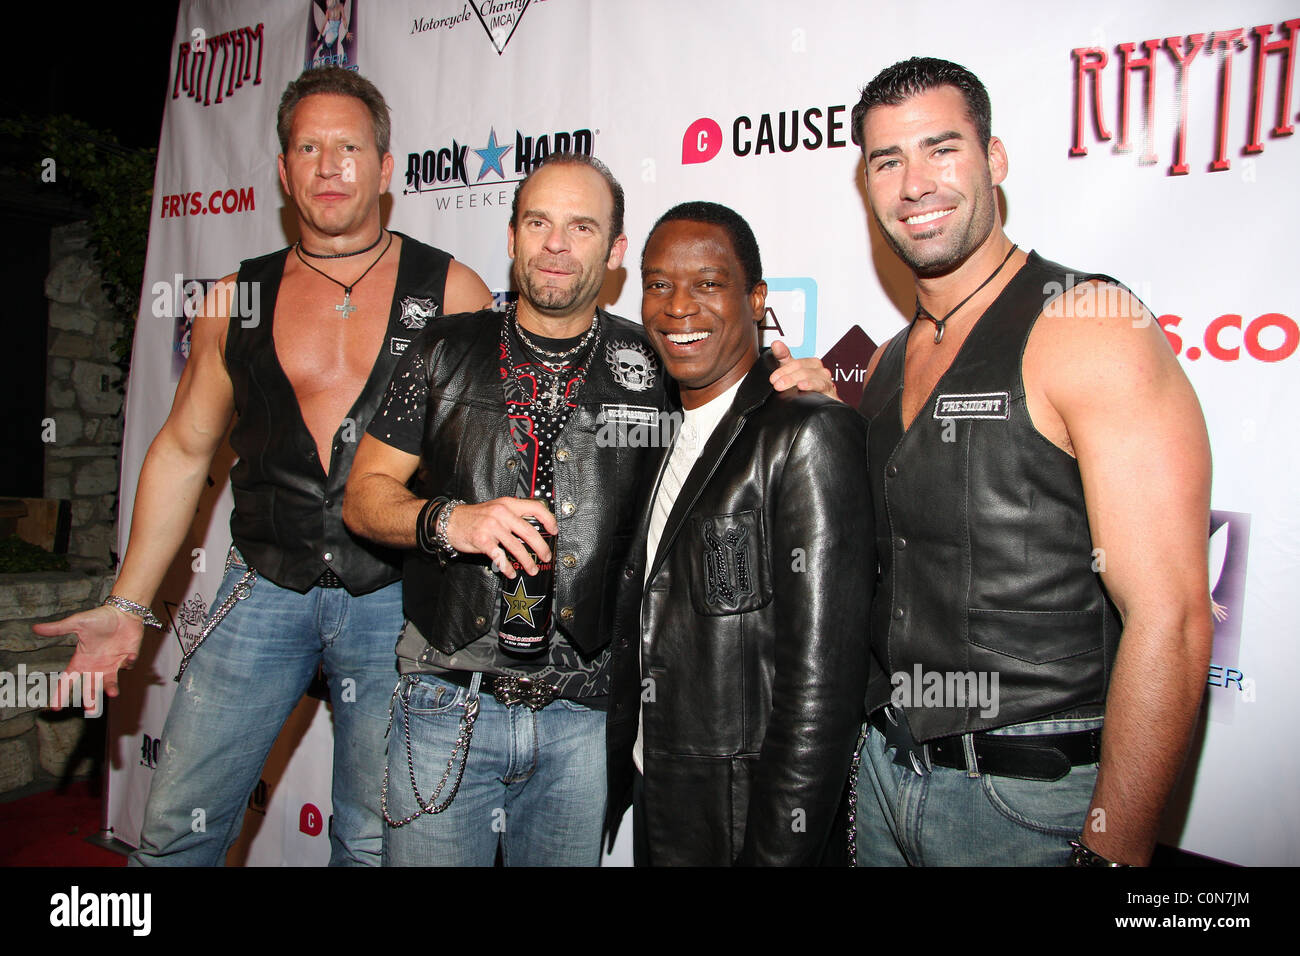 Rock hard men